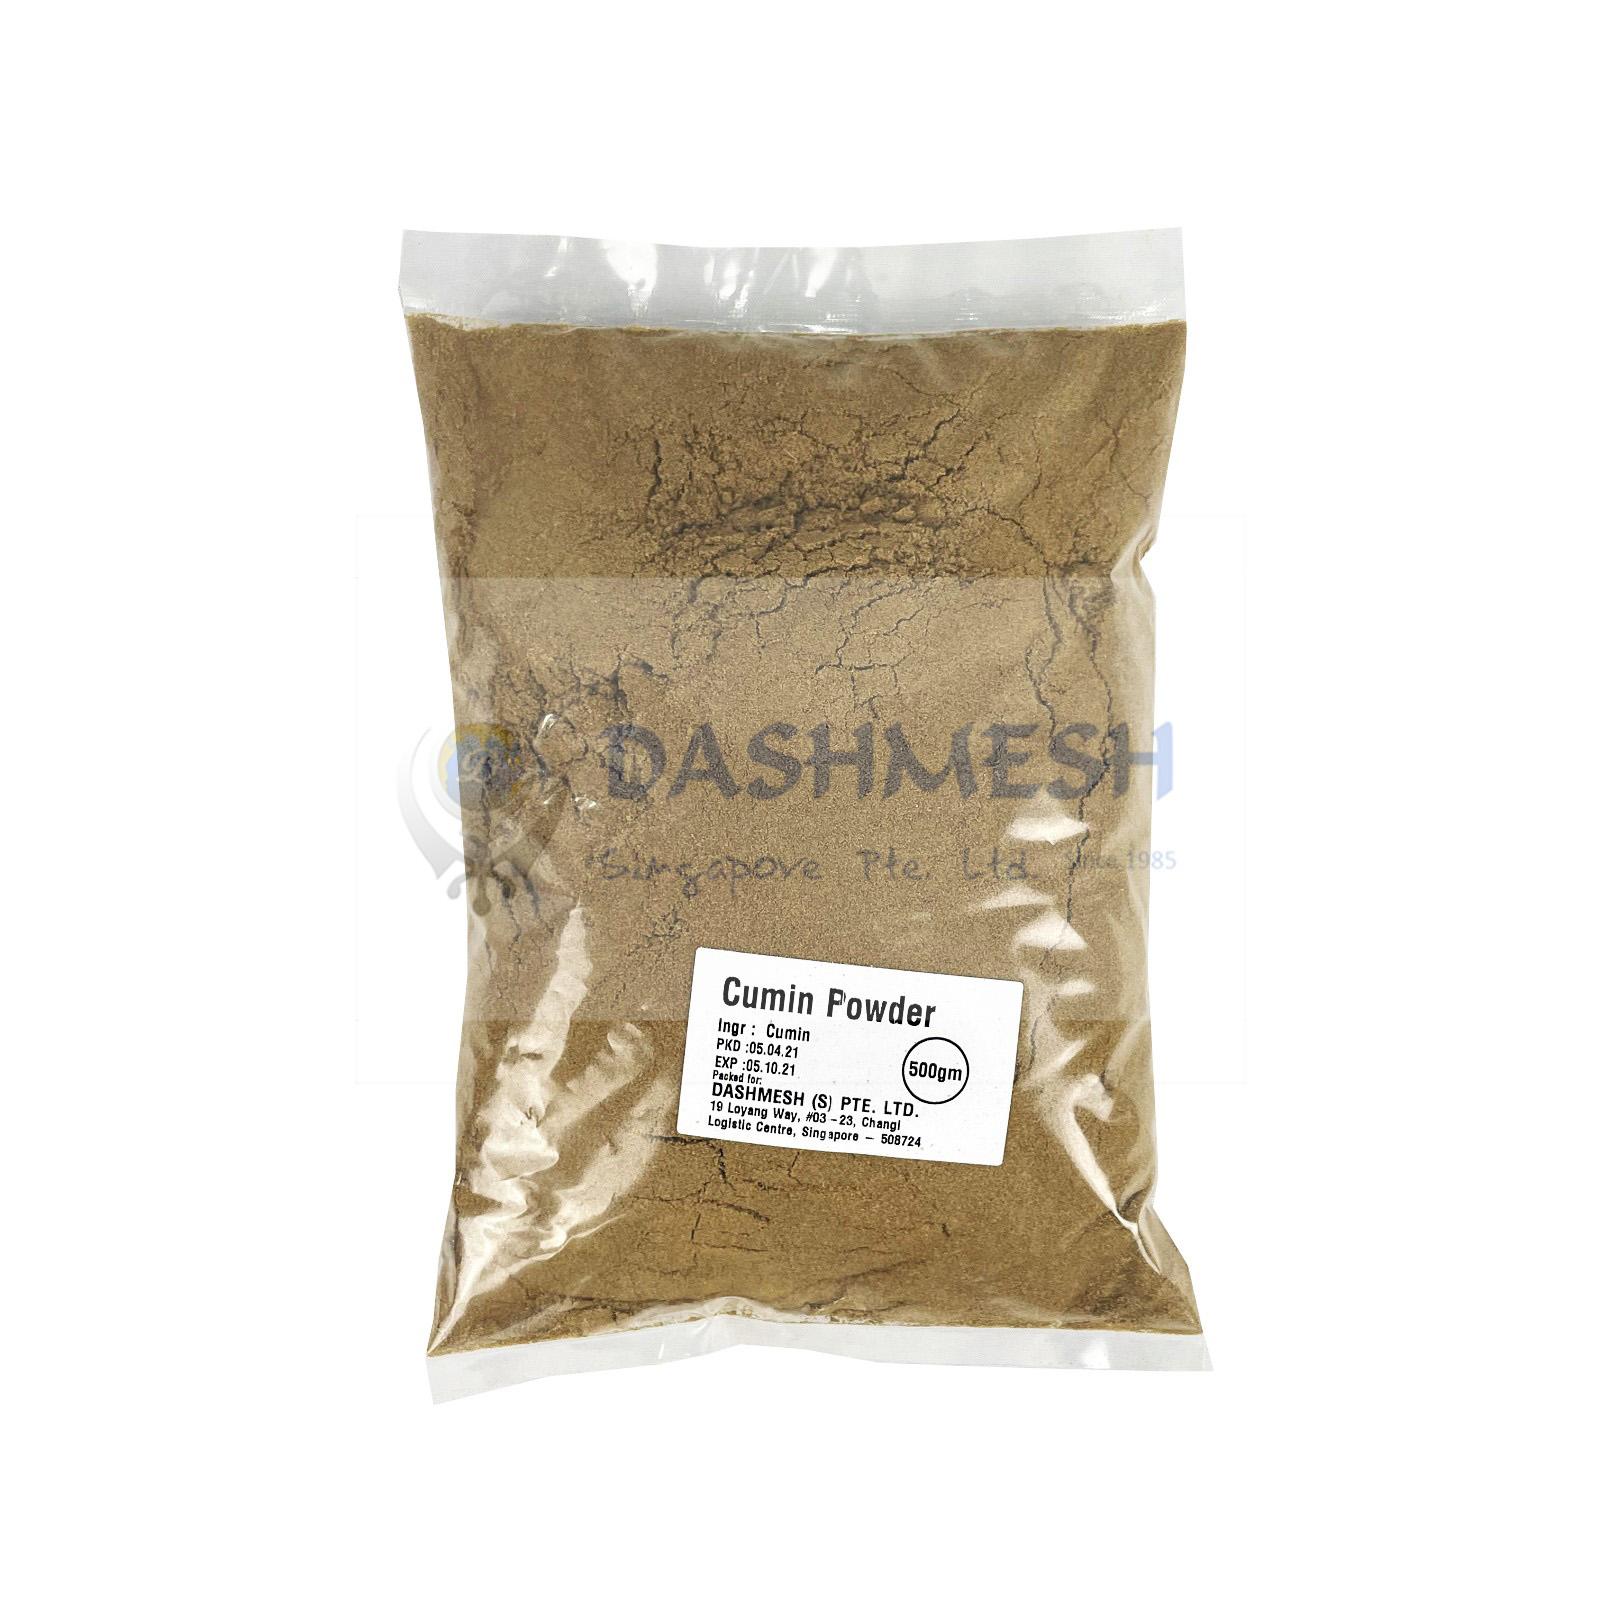 Cumin Powder (A Grade) 500g & 5kg